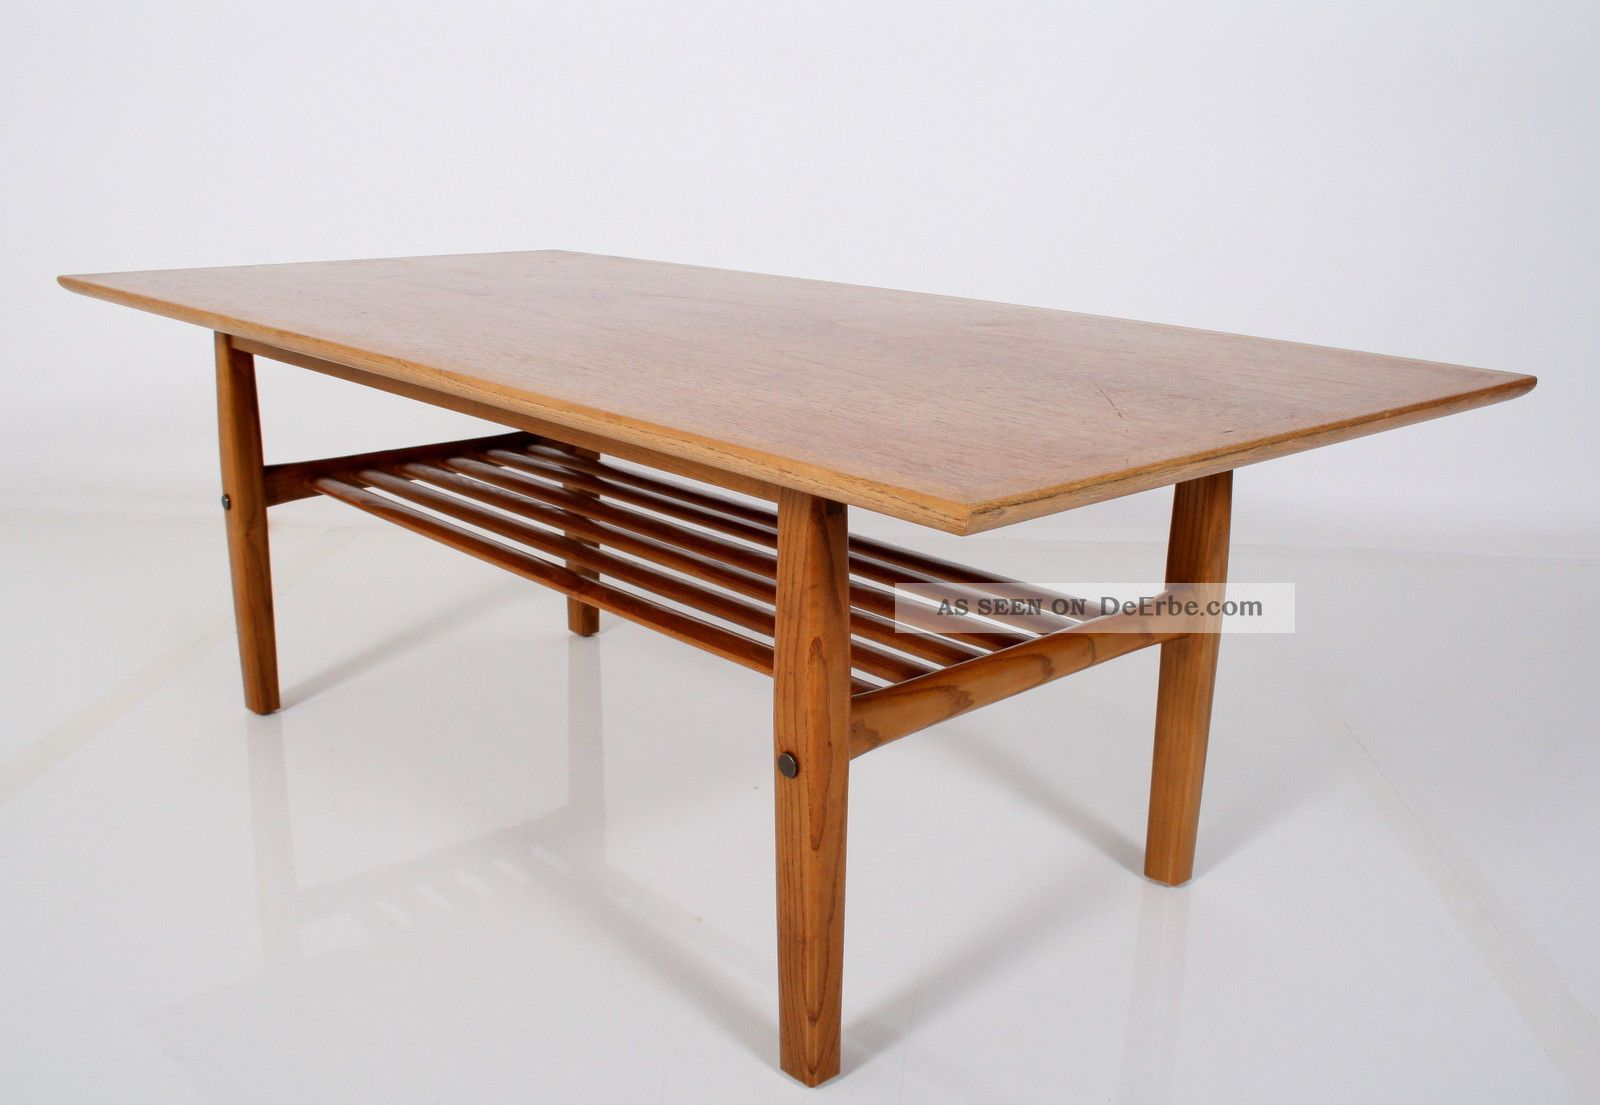 teak 60er coffee table danish design couchtisch tisch table 60s a 60 tavolo. Black Bedroom Furniture Sets. Home Design Ideas